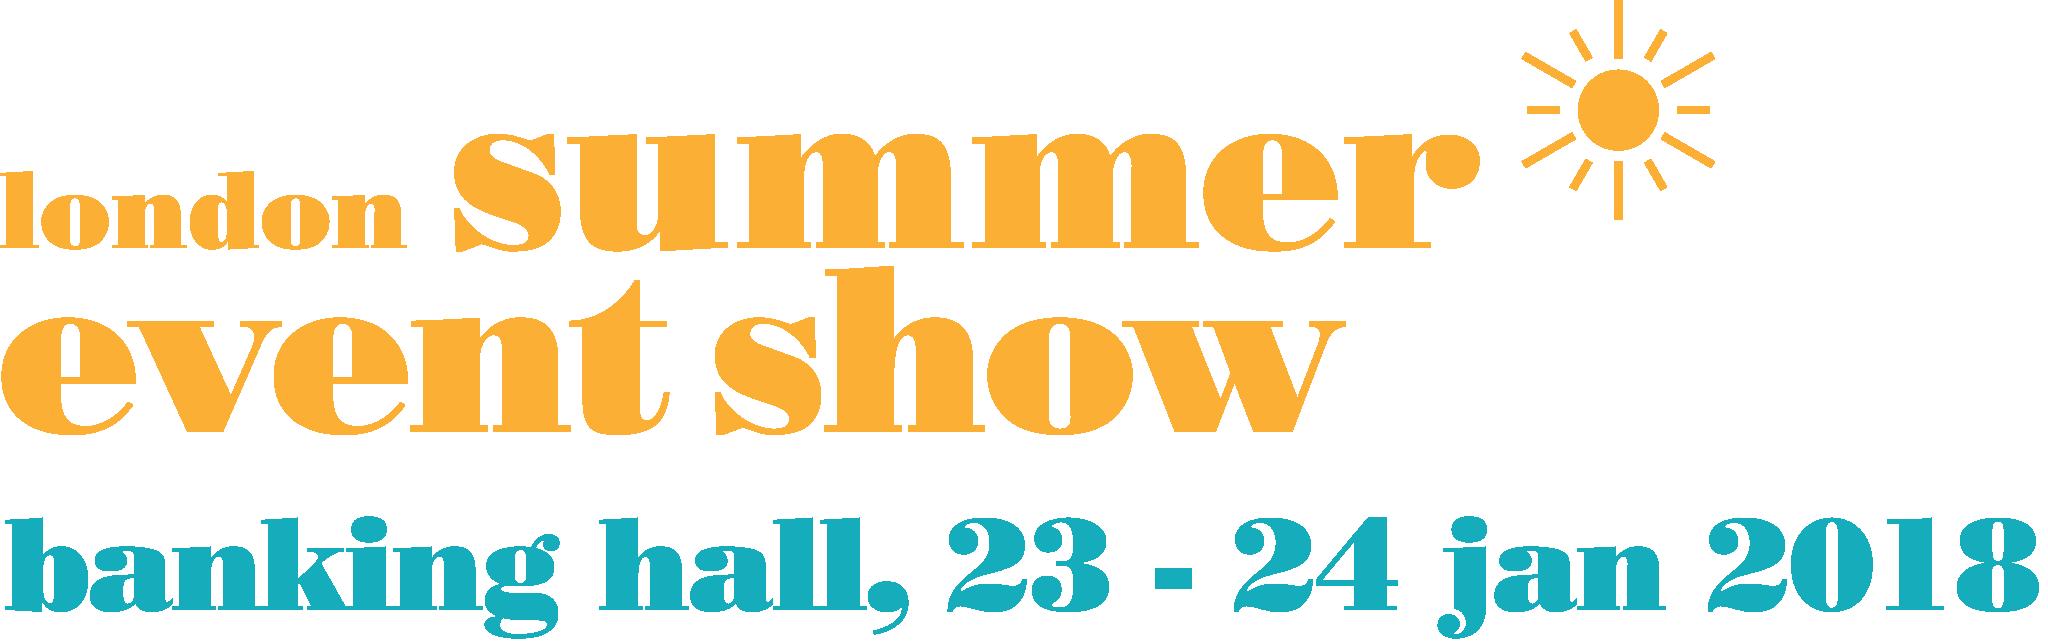 London Summer Event Show 2019